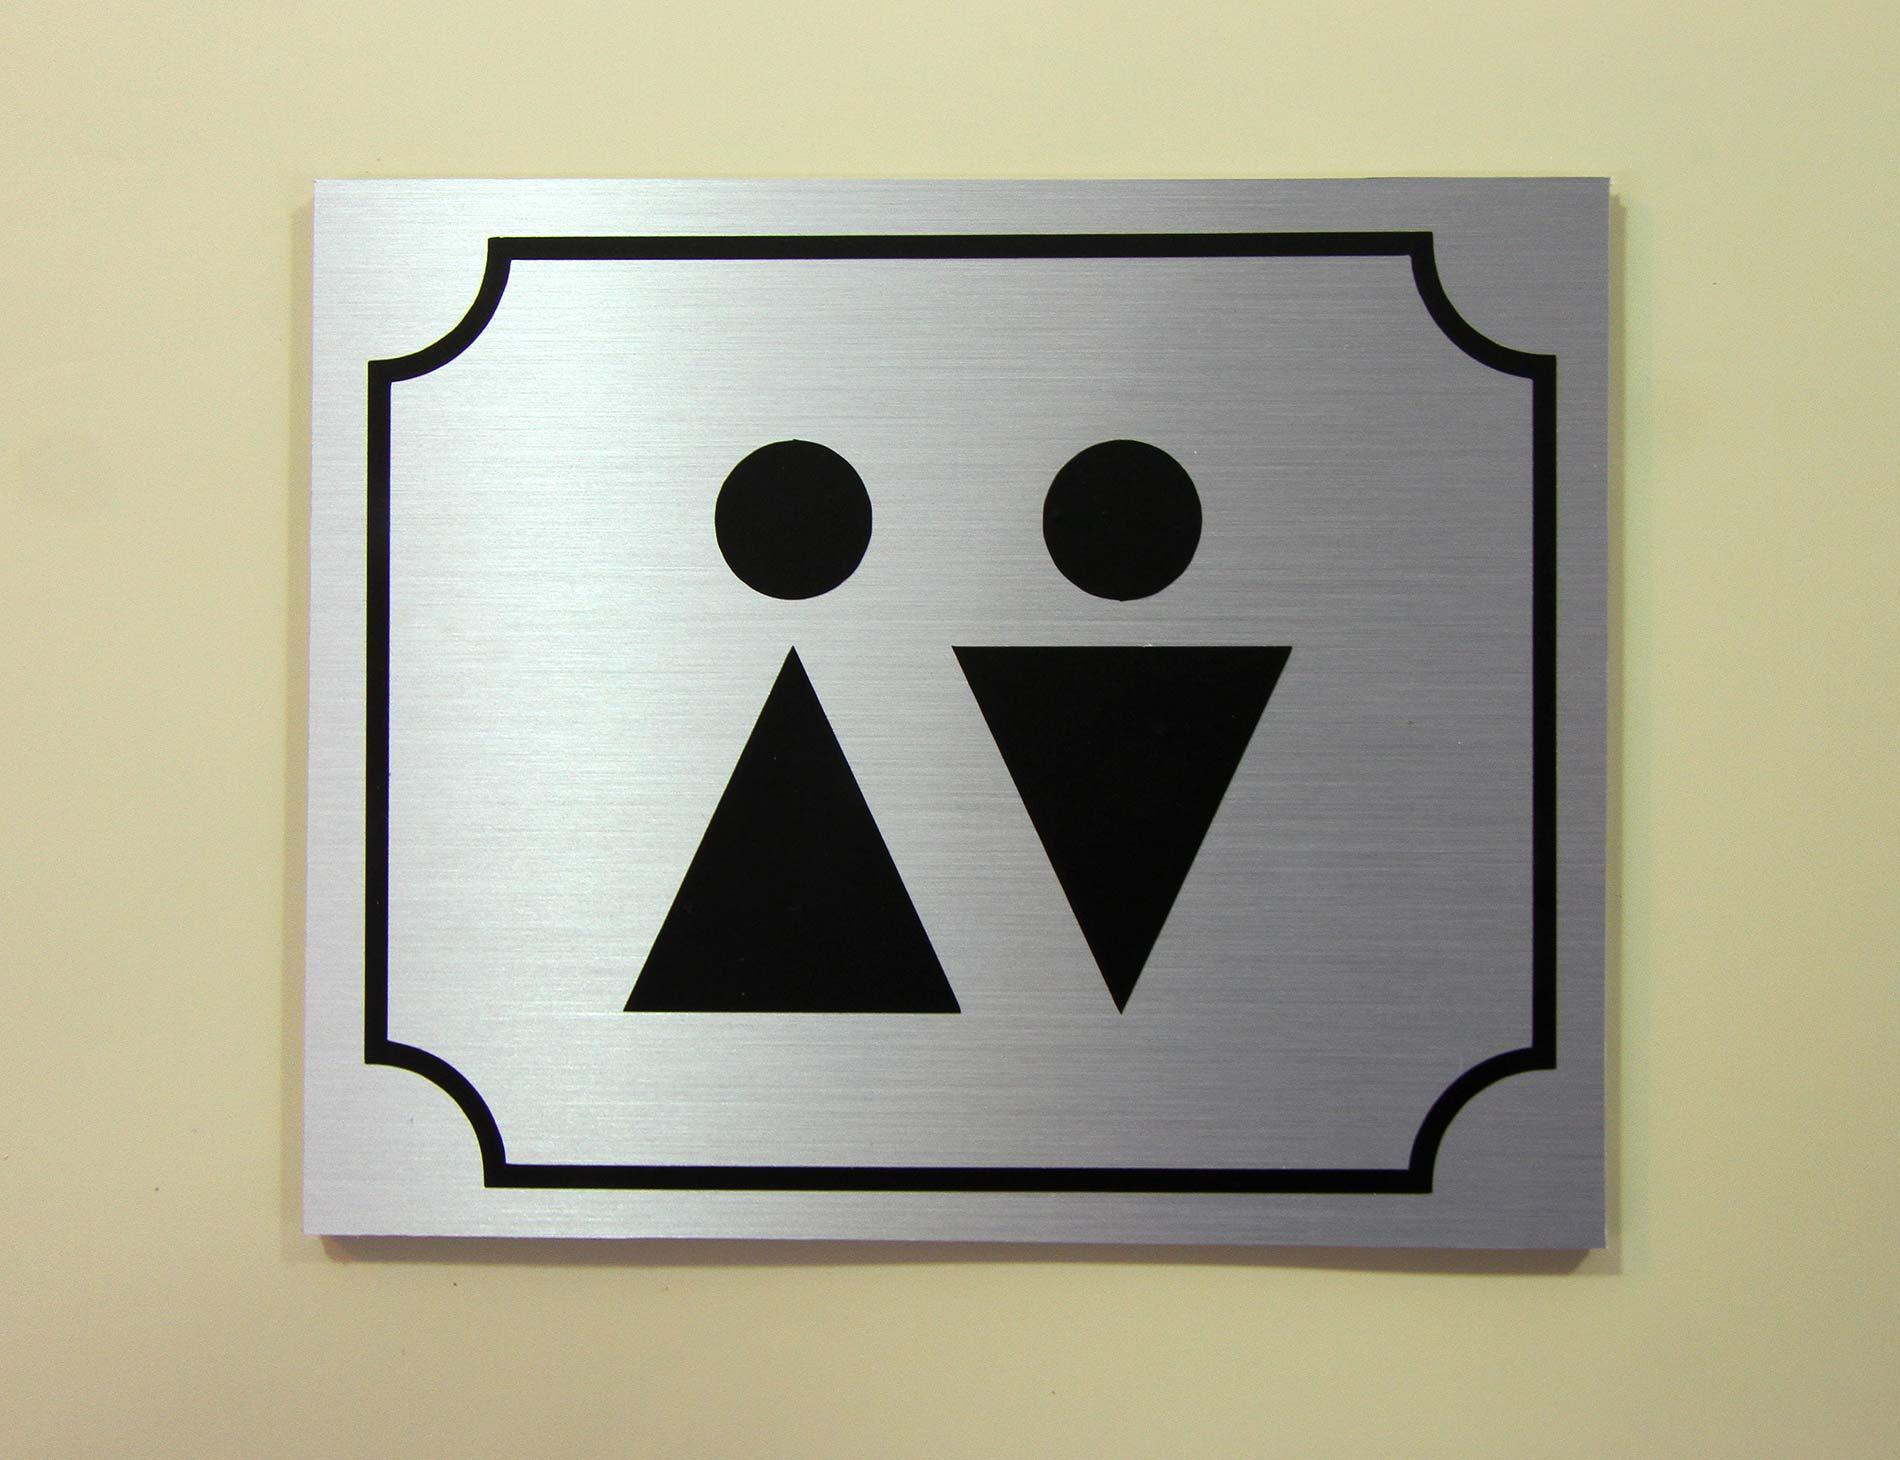 Табличка из фактурного металлопластика